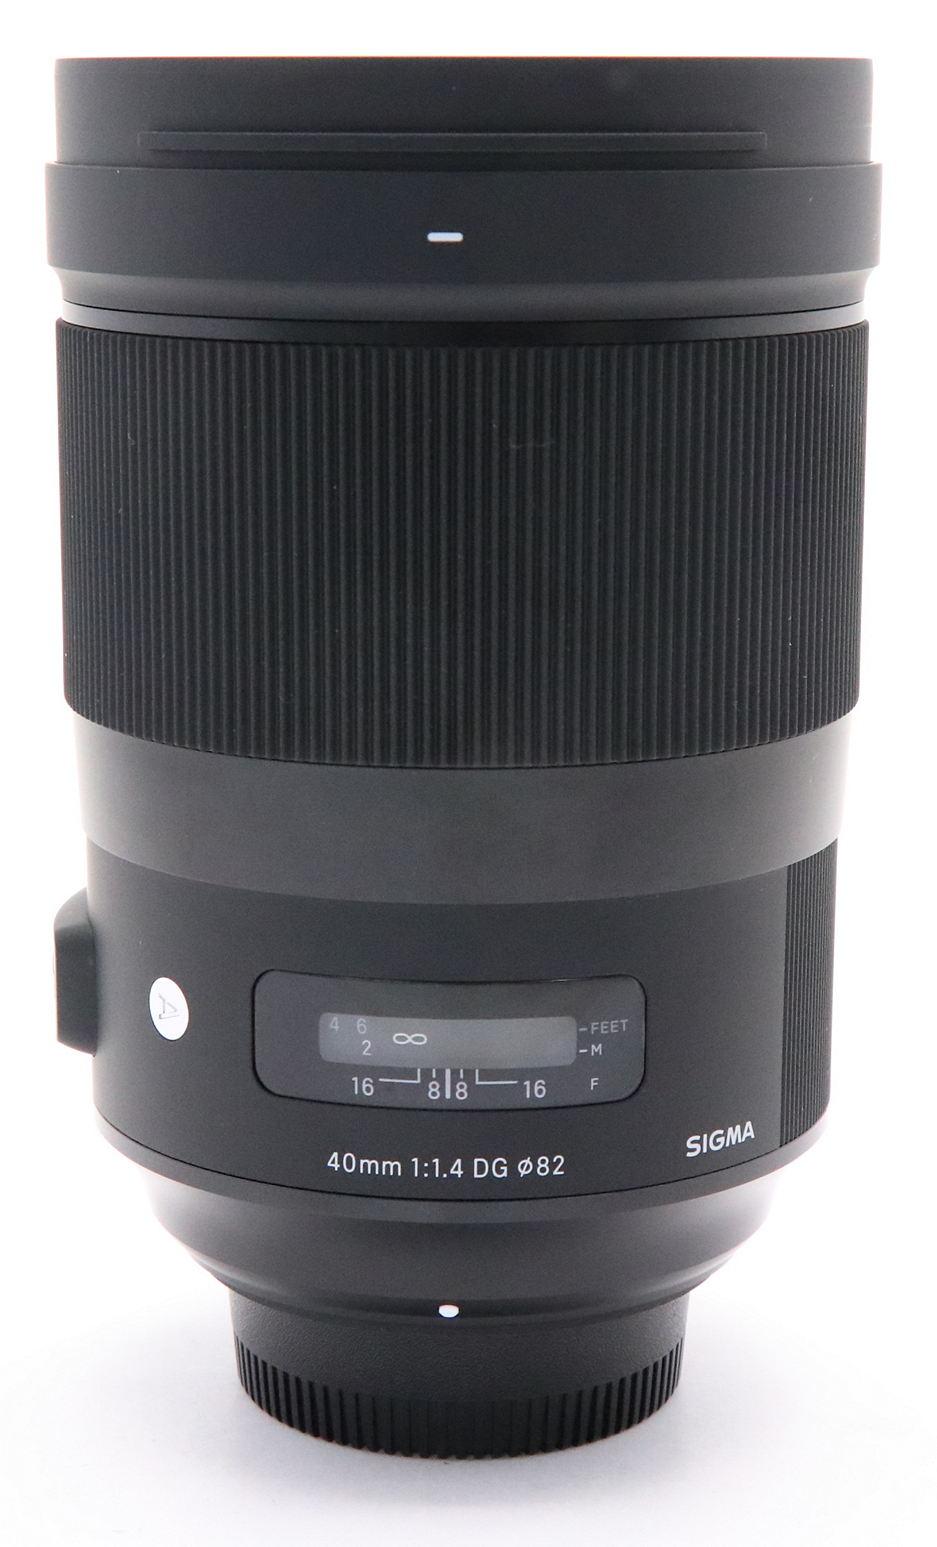 SIGMA 40mm F1.4 DG HSM Art фото внешнего вида